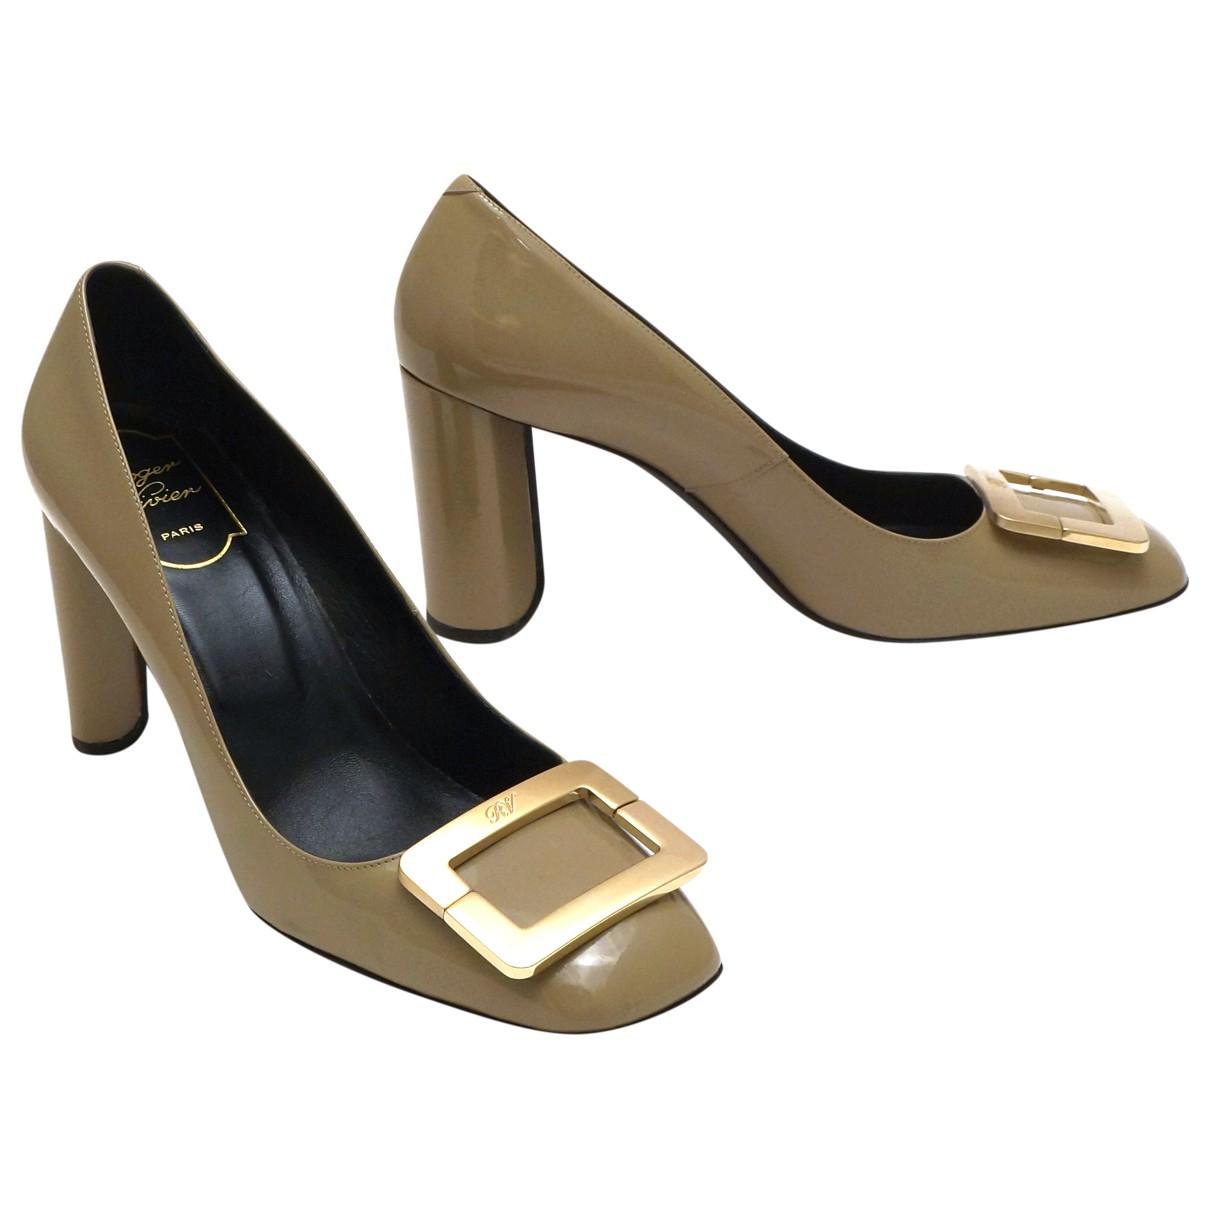 Roger Vivier Belle de Nuit Beige Patent leather Heels for Women 38 EU